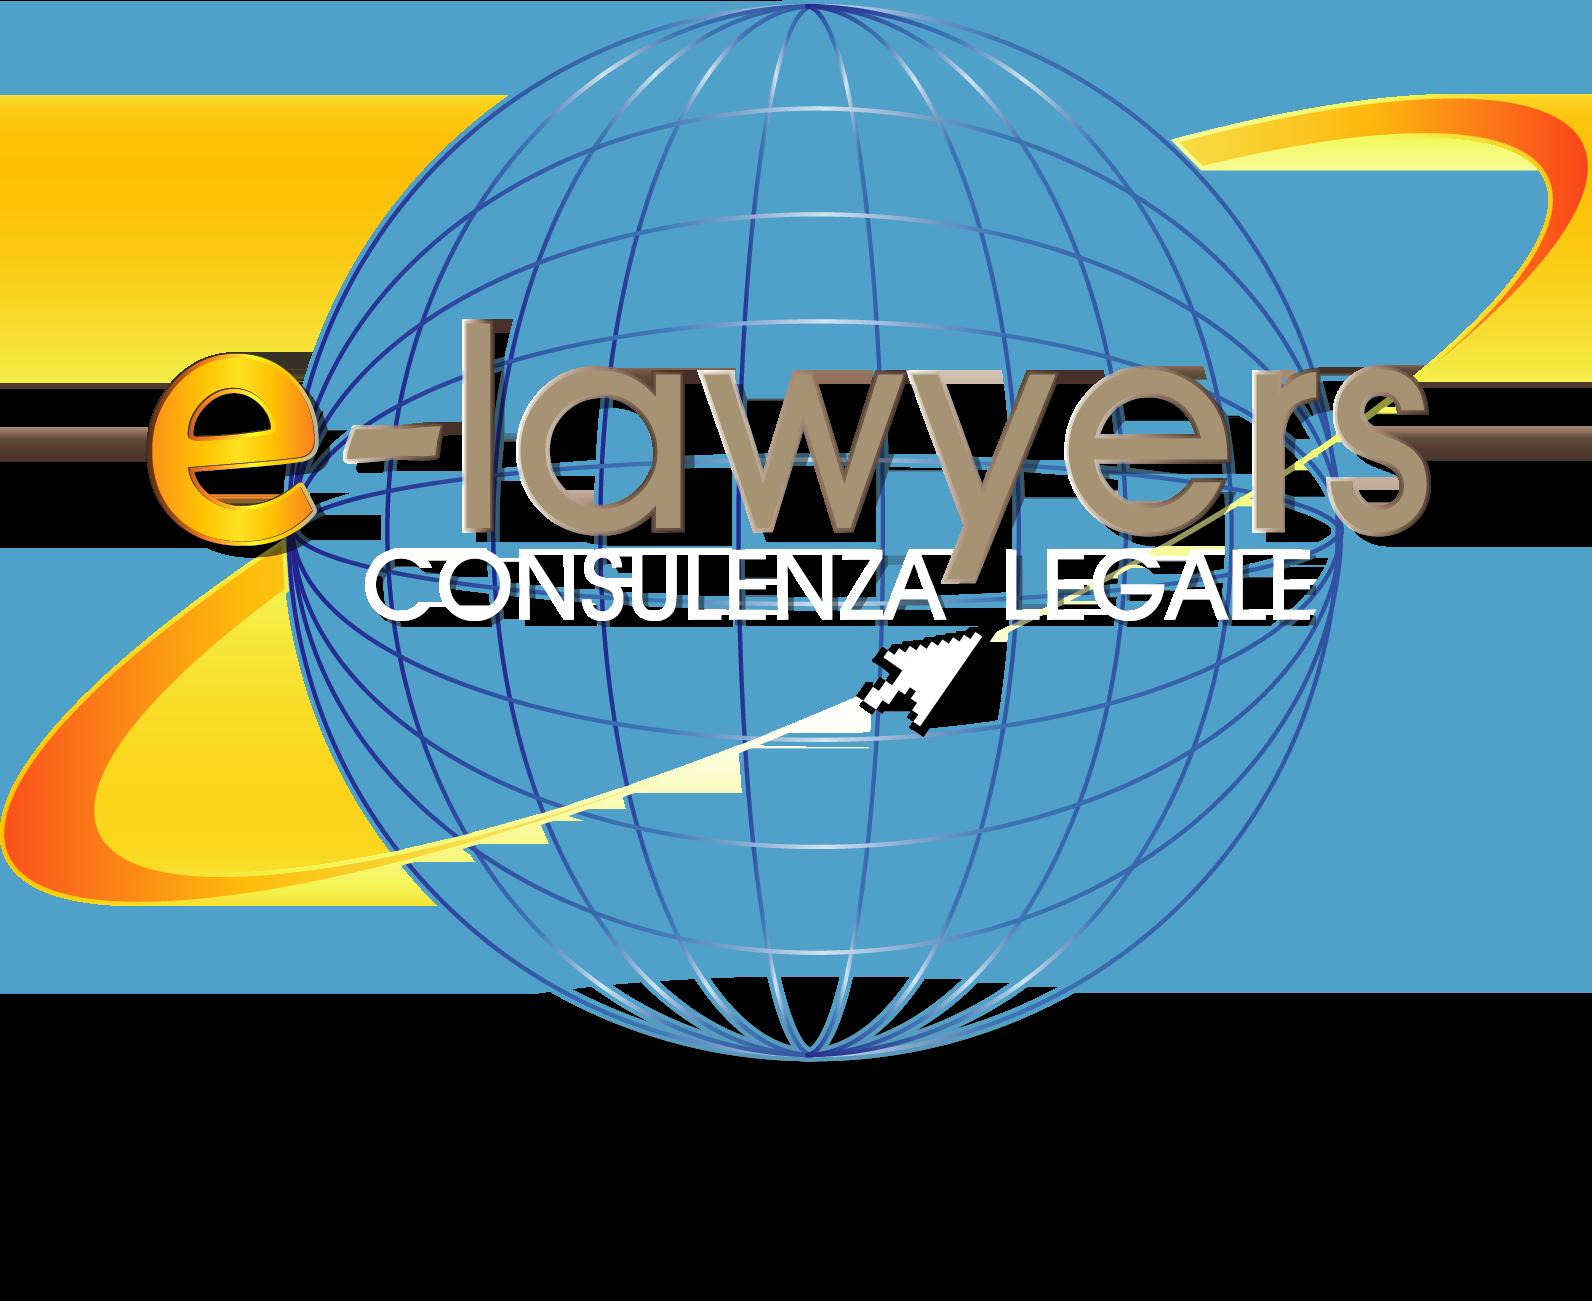 e-lawyers logo